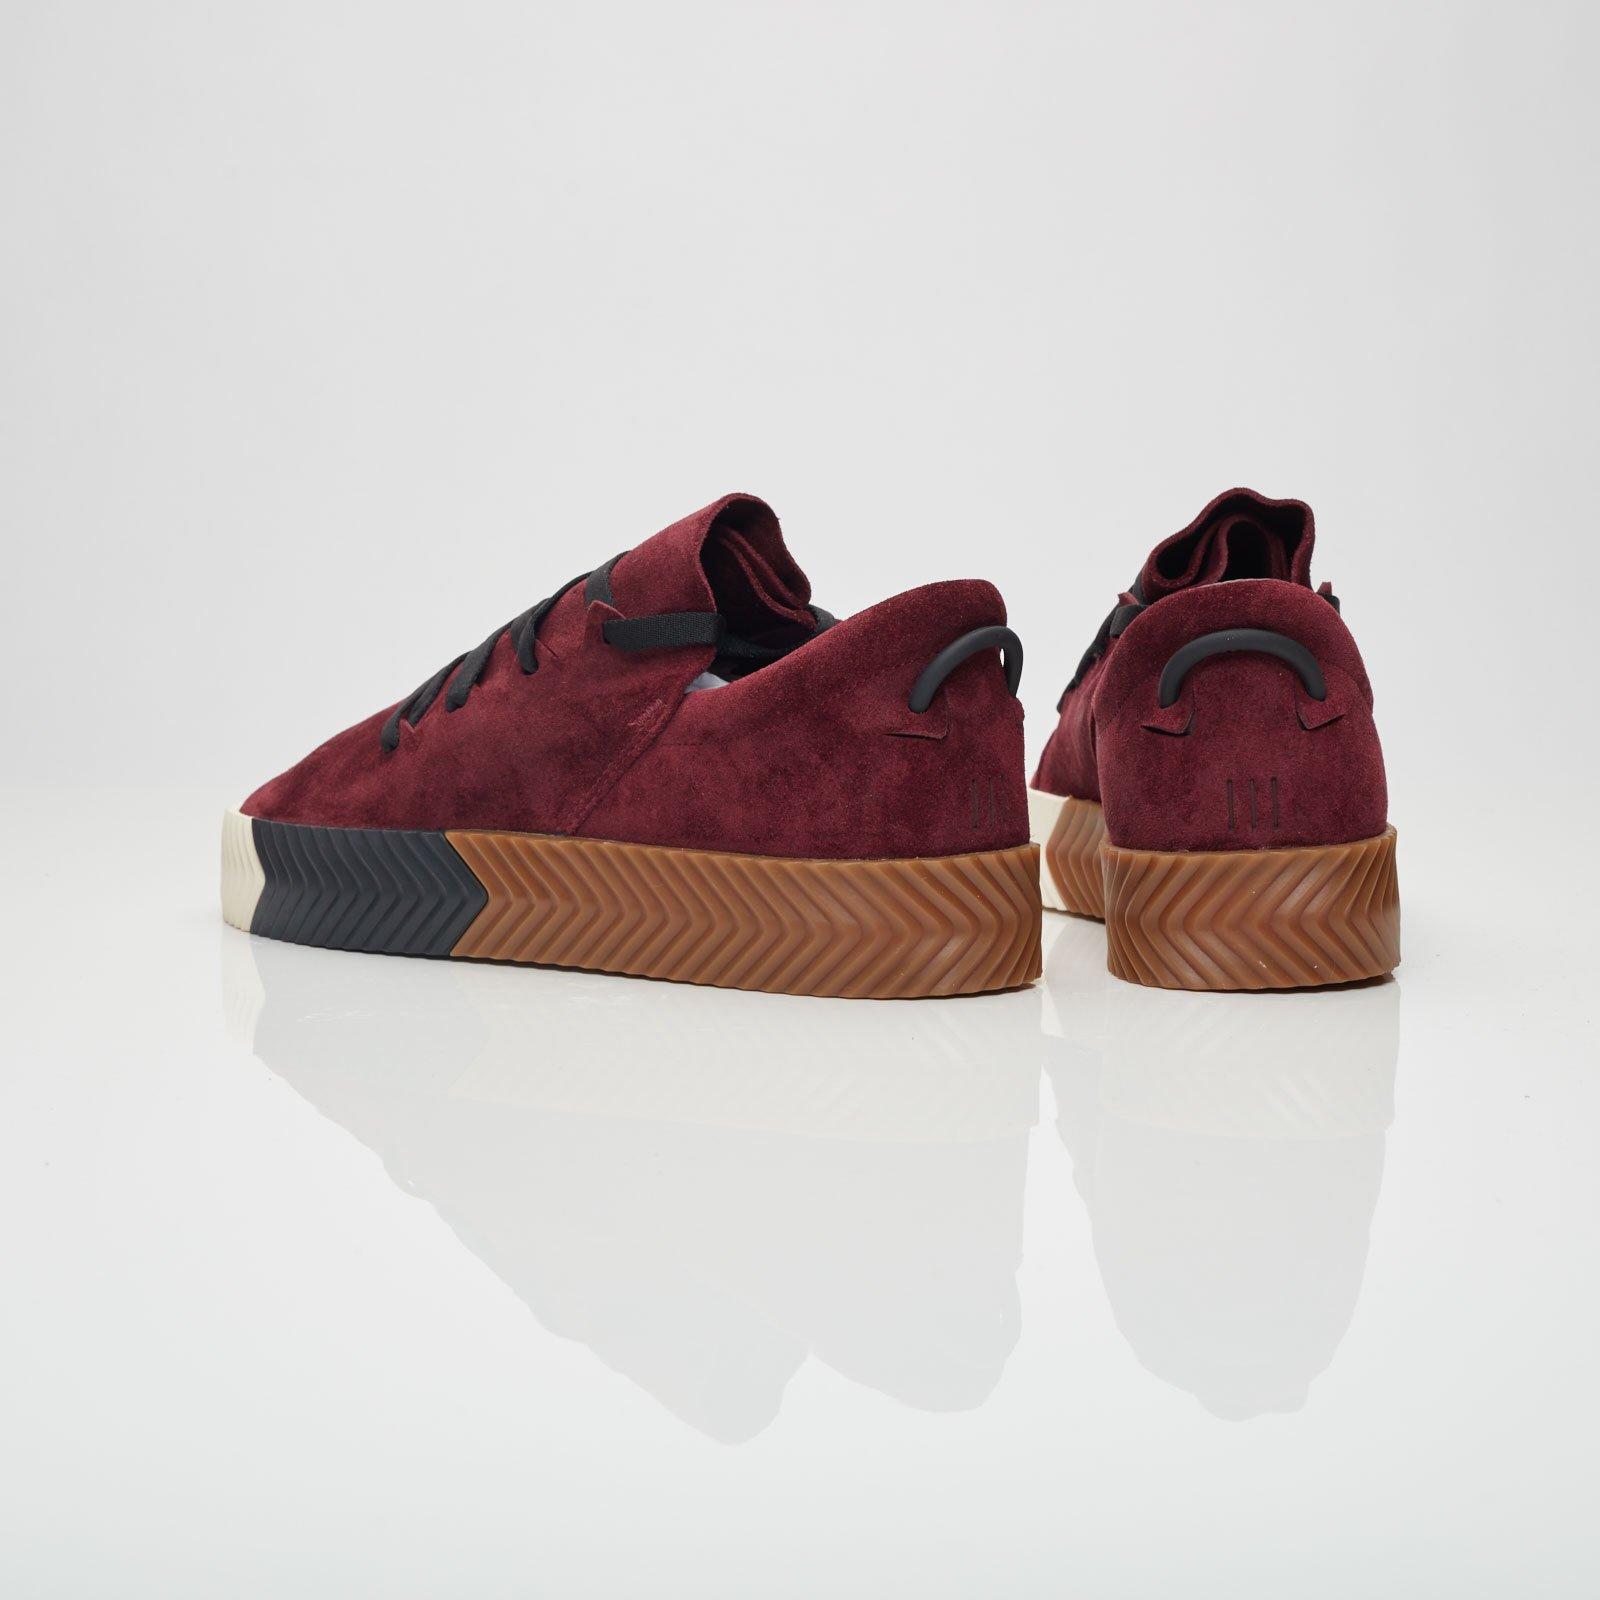 size 40 9a190 92db7 ... adidas Originals by Alexander Wang AW Skate ...